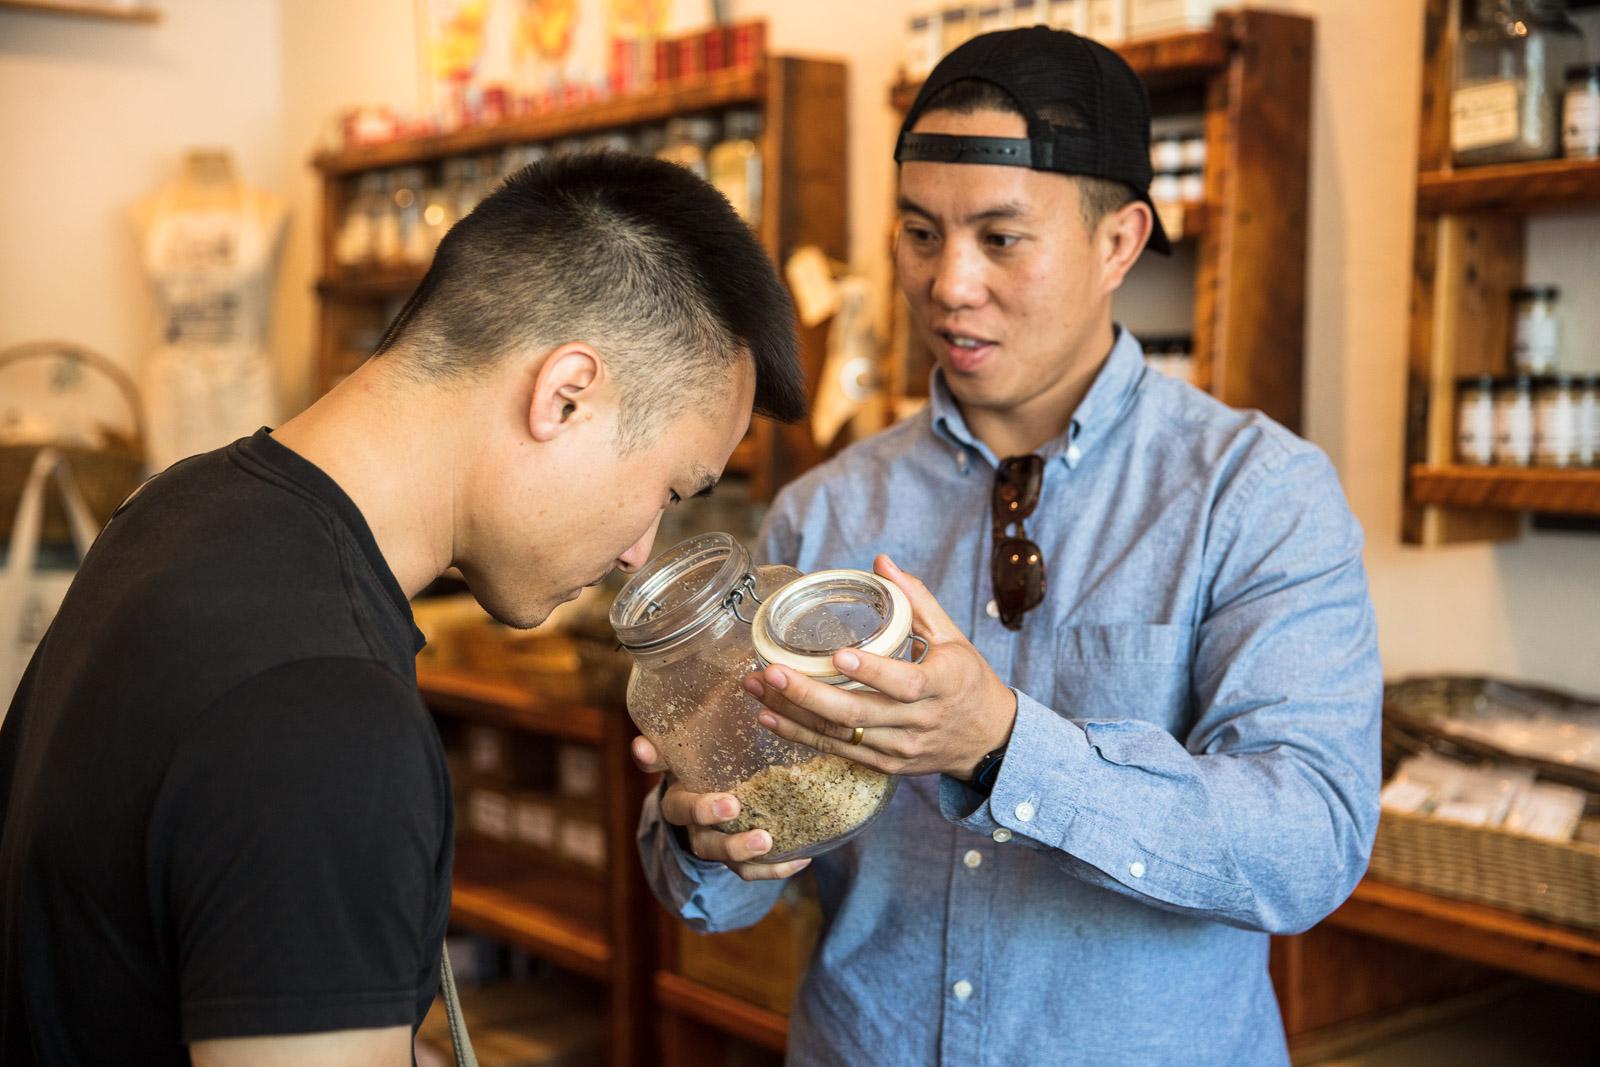 Peter of Peter's Kettle Corn shares the aroma of John's Wild Mushroom Sea Salt